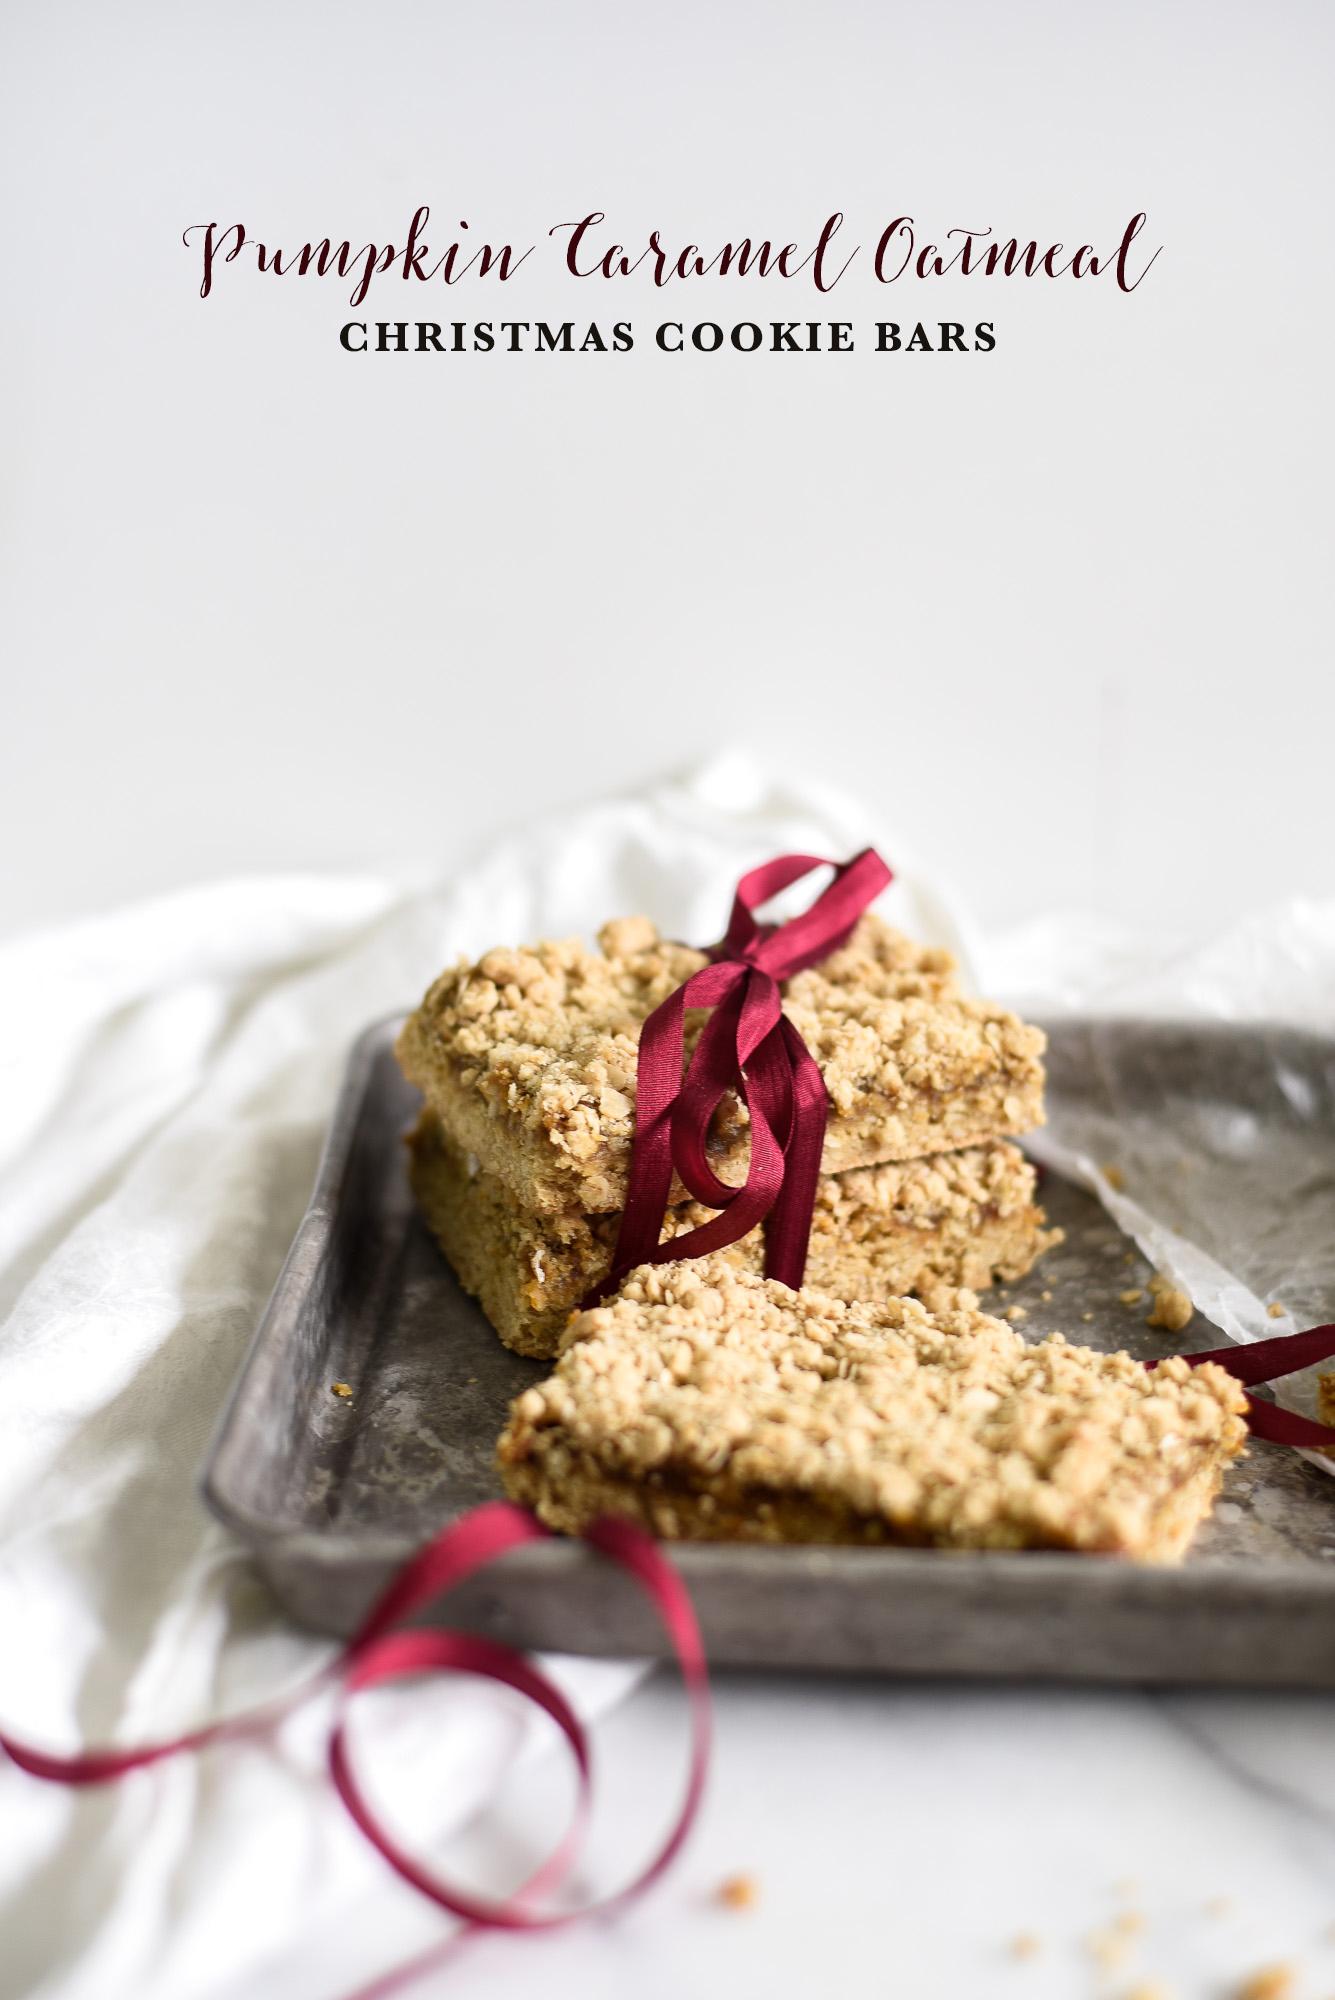 Christmas Cookies & Bars   8 Classic Holiday Dessert Recipes to try!  boxwoodavenue.com